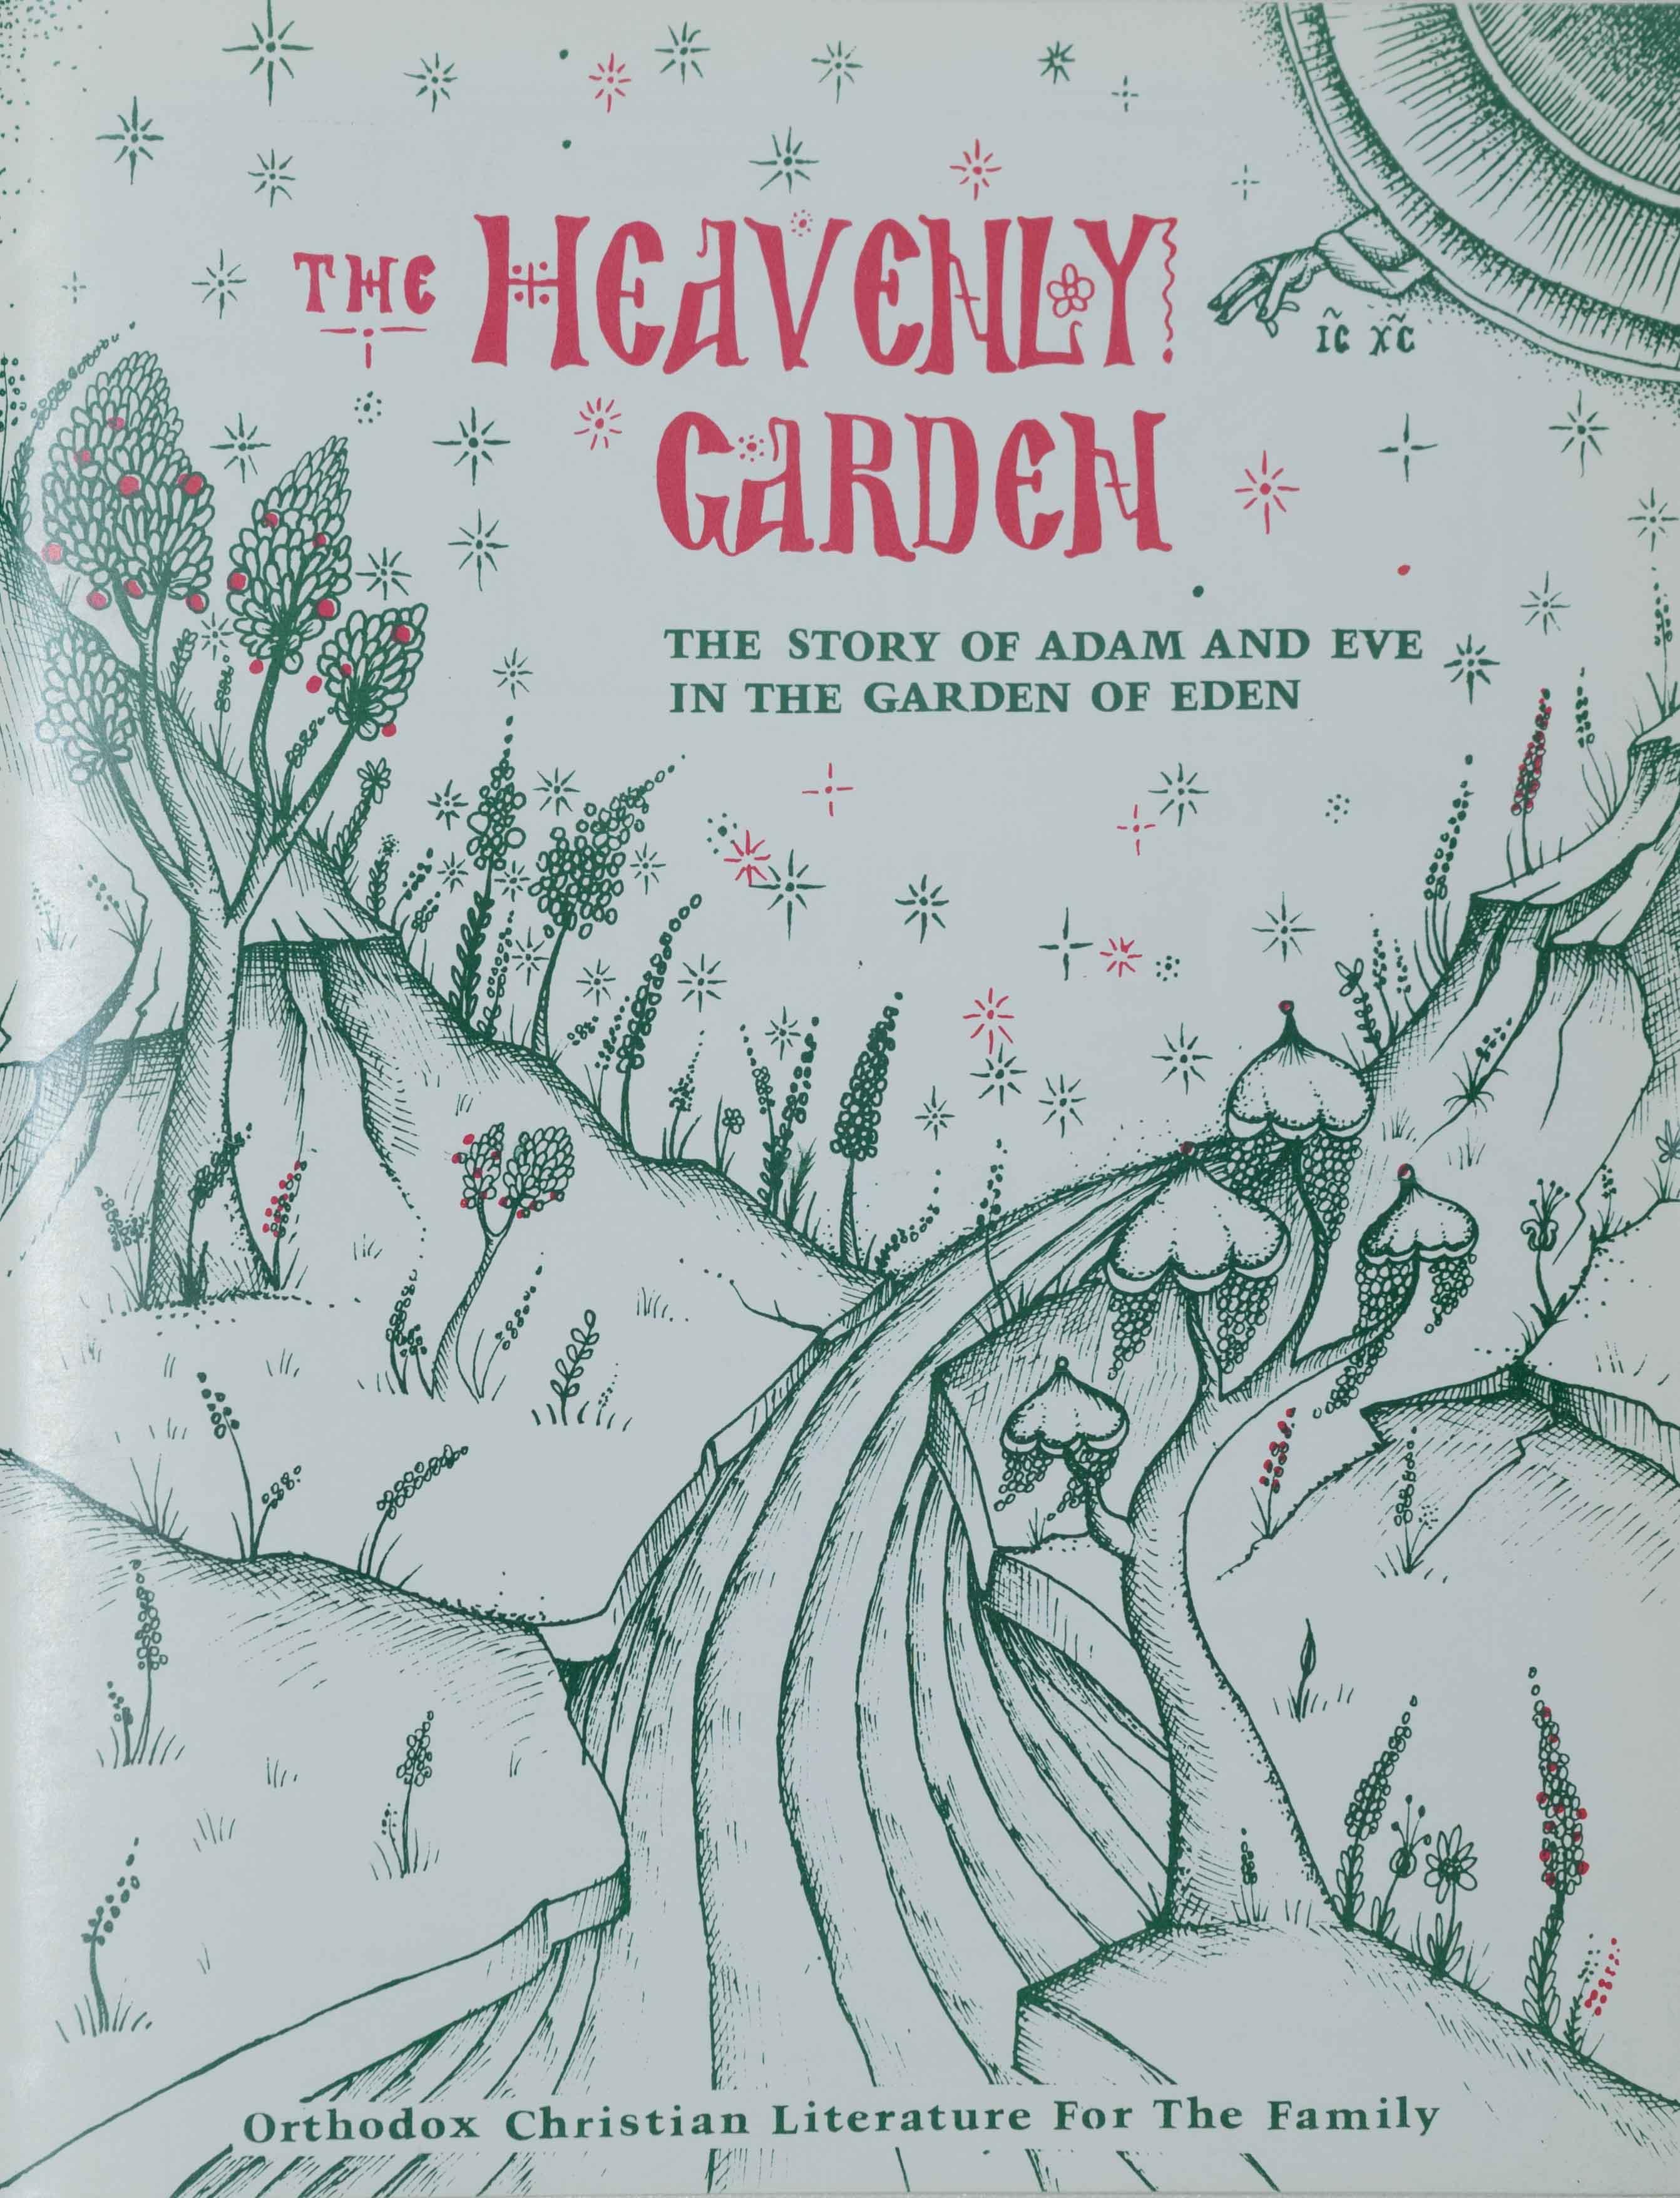 The Heavenly Garden: The Story of Adam and Eve in the Garden of Eden